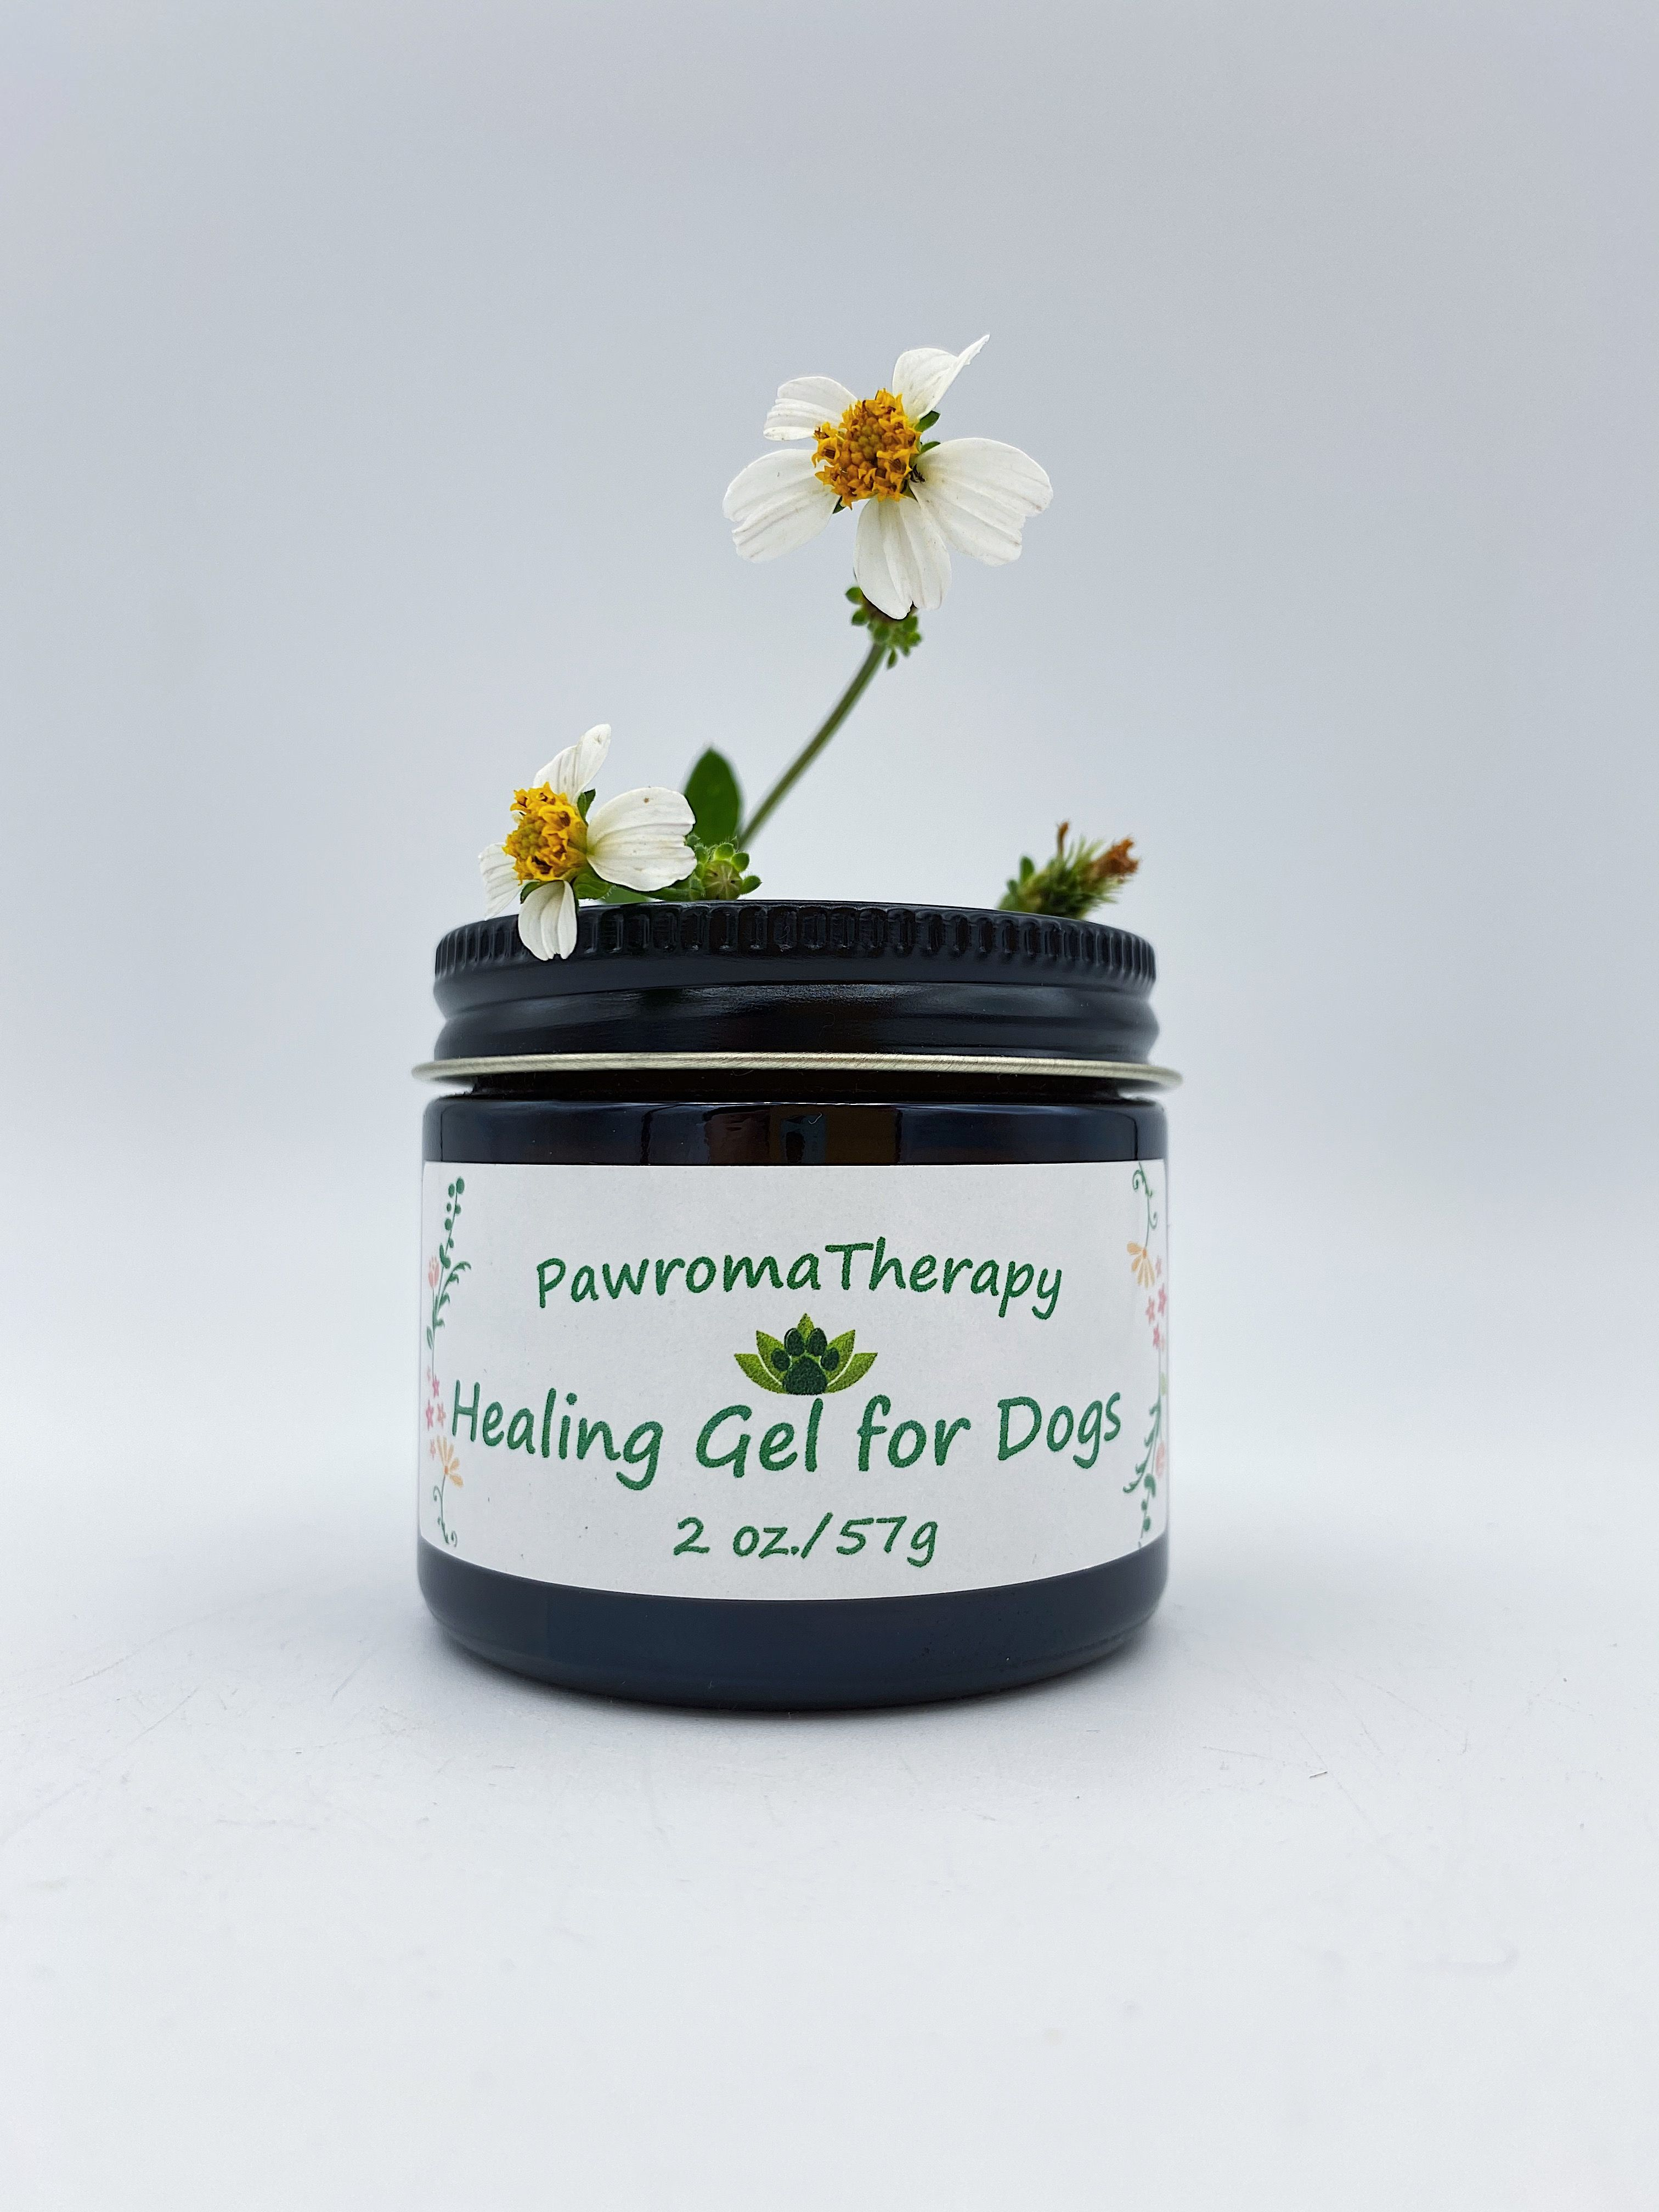 Healing Gel for Dogs, Amber Glass Jar, 2 oz, Natural Skin